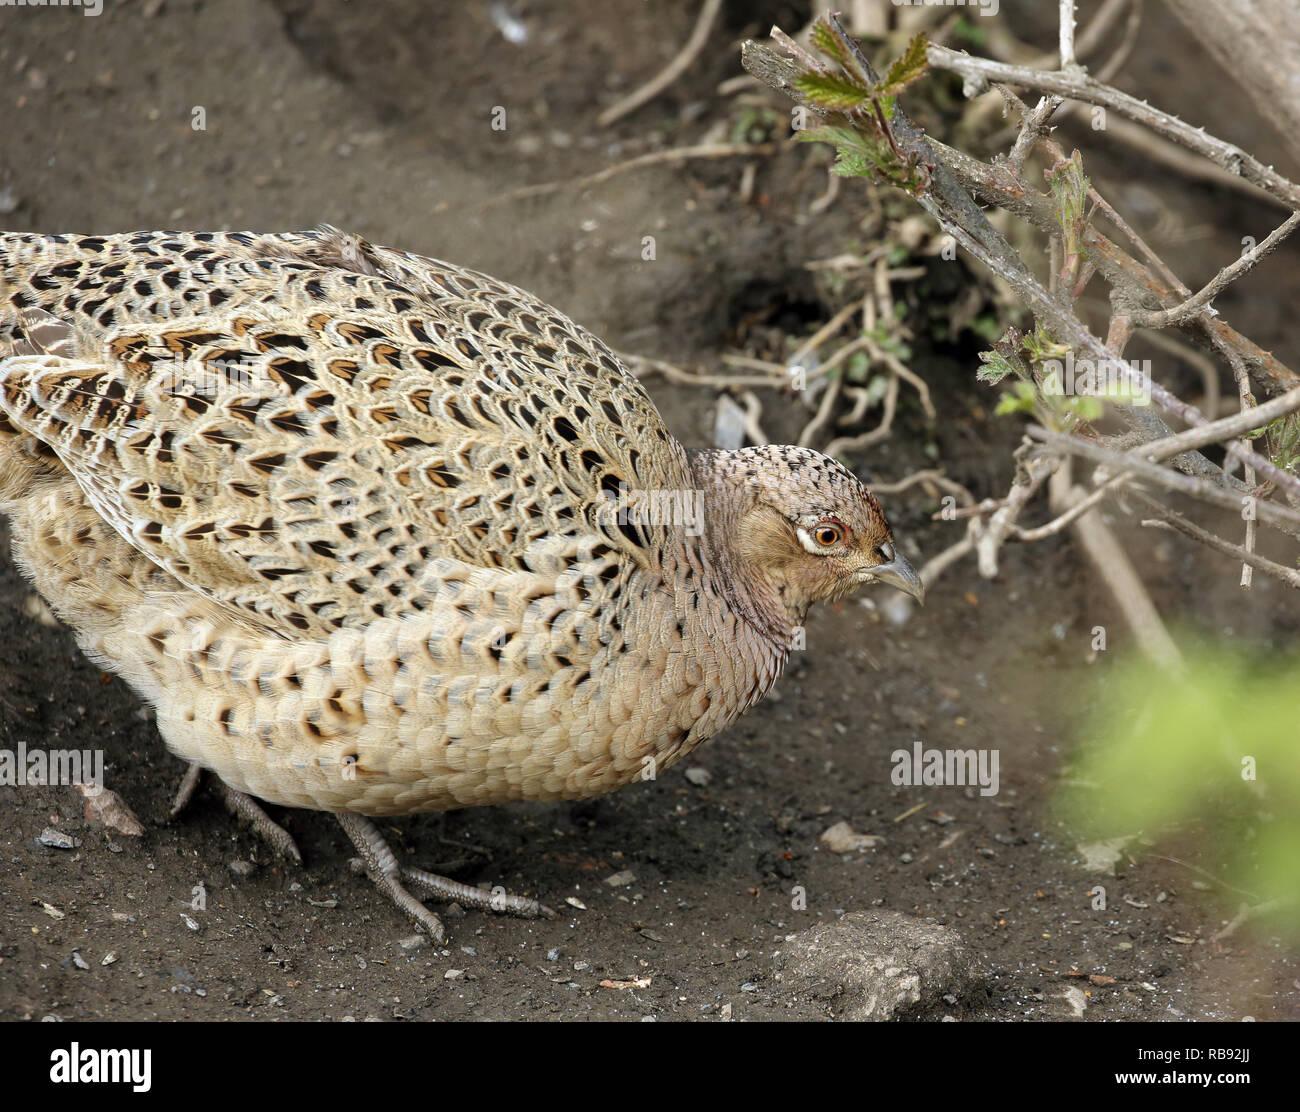 Female pheasant, Phasianus colchicus, walking on the ground. - Stock Image